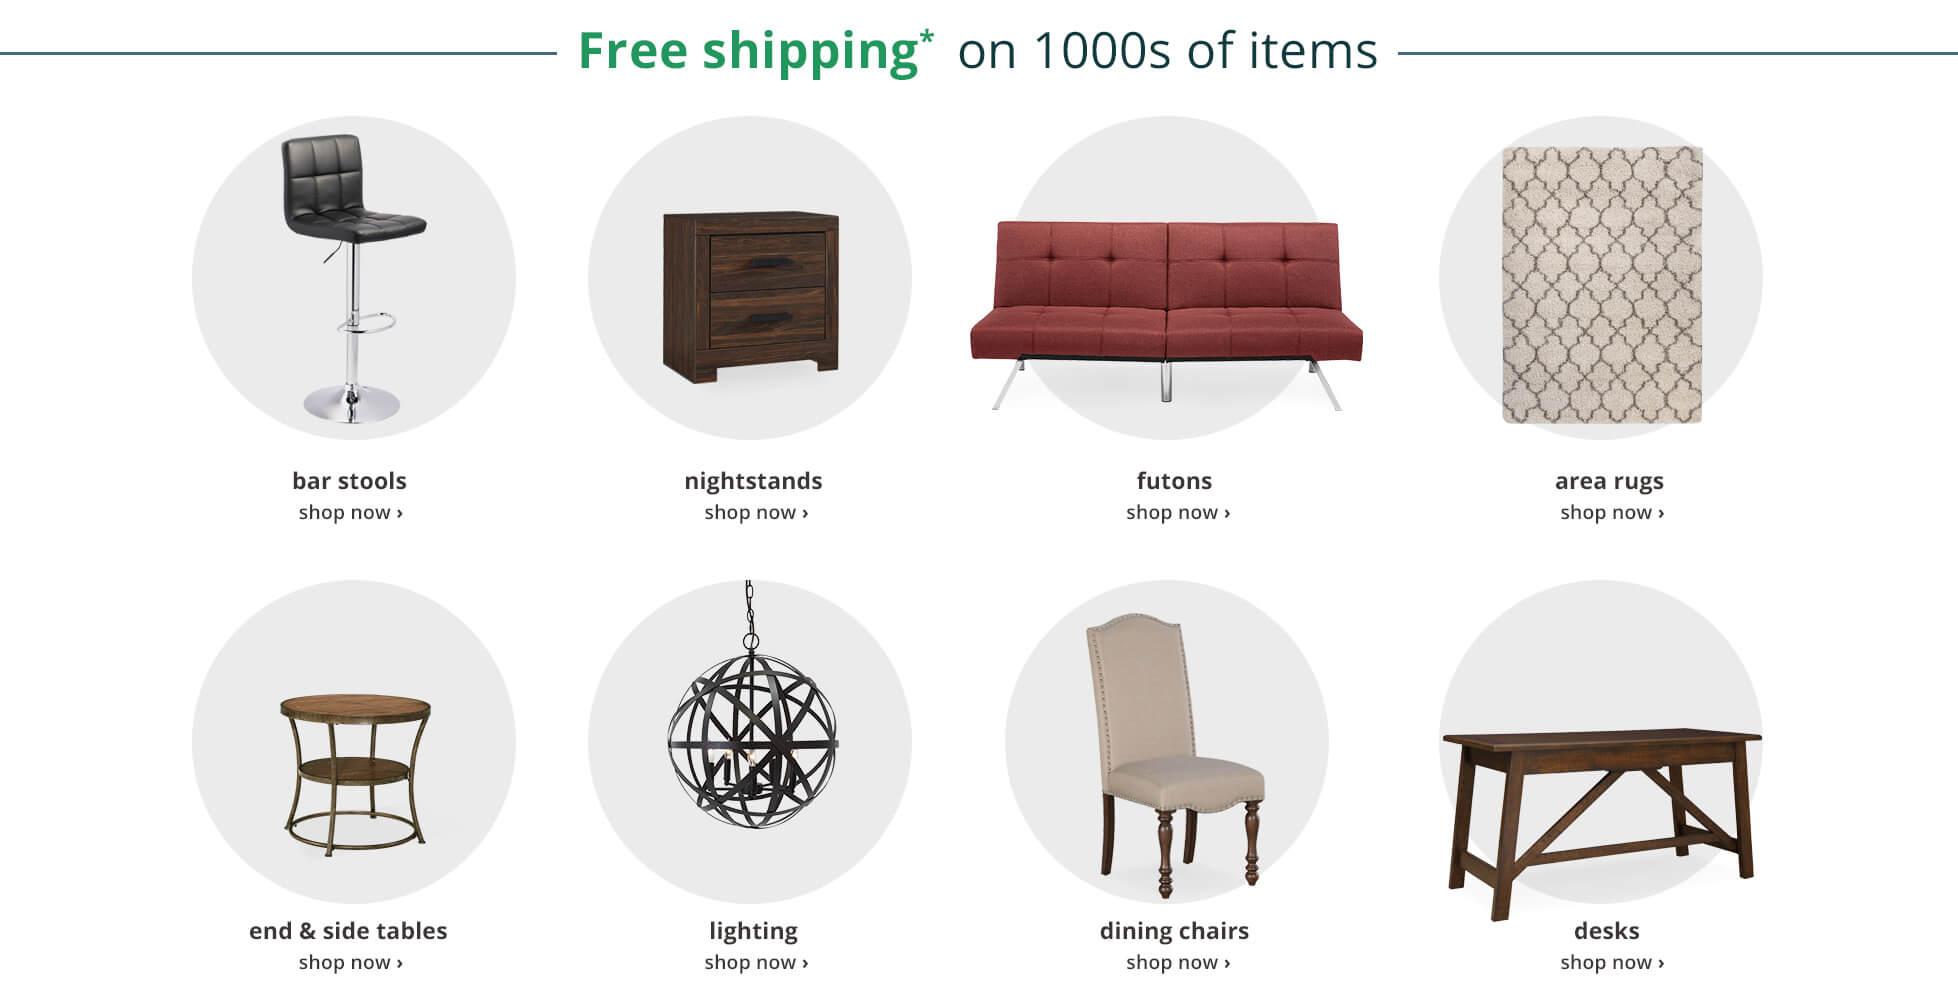 Ashley Furniture HomeStore Home Furniture & Decor